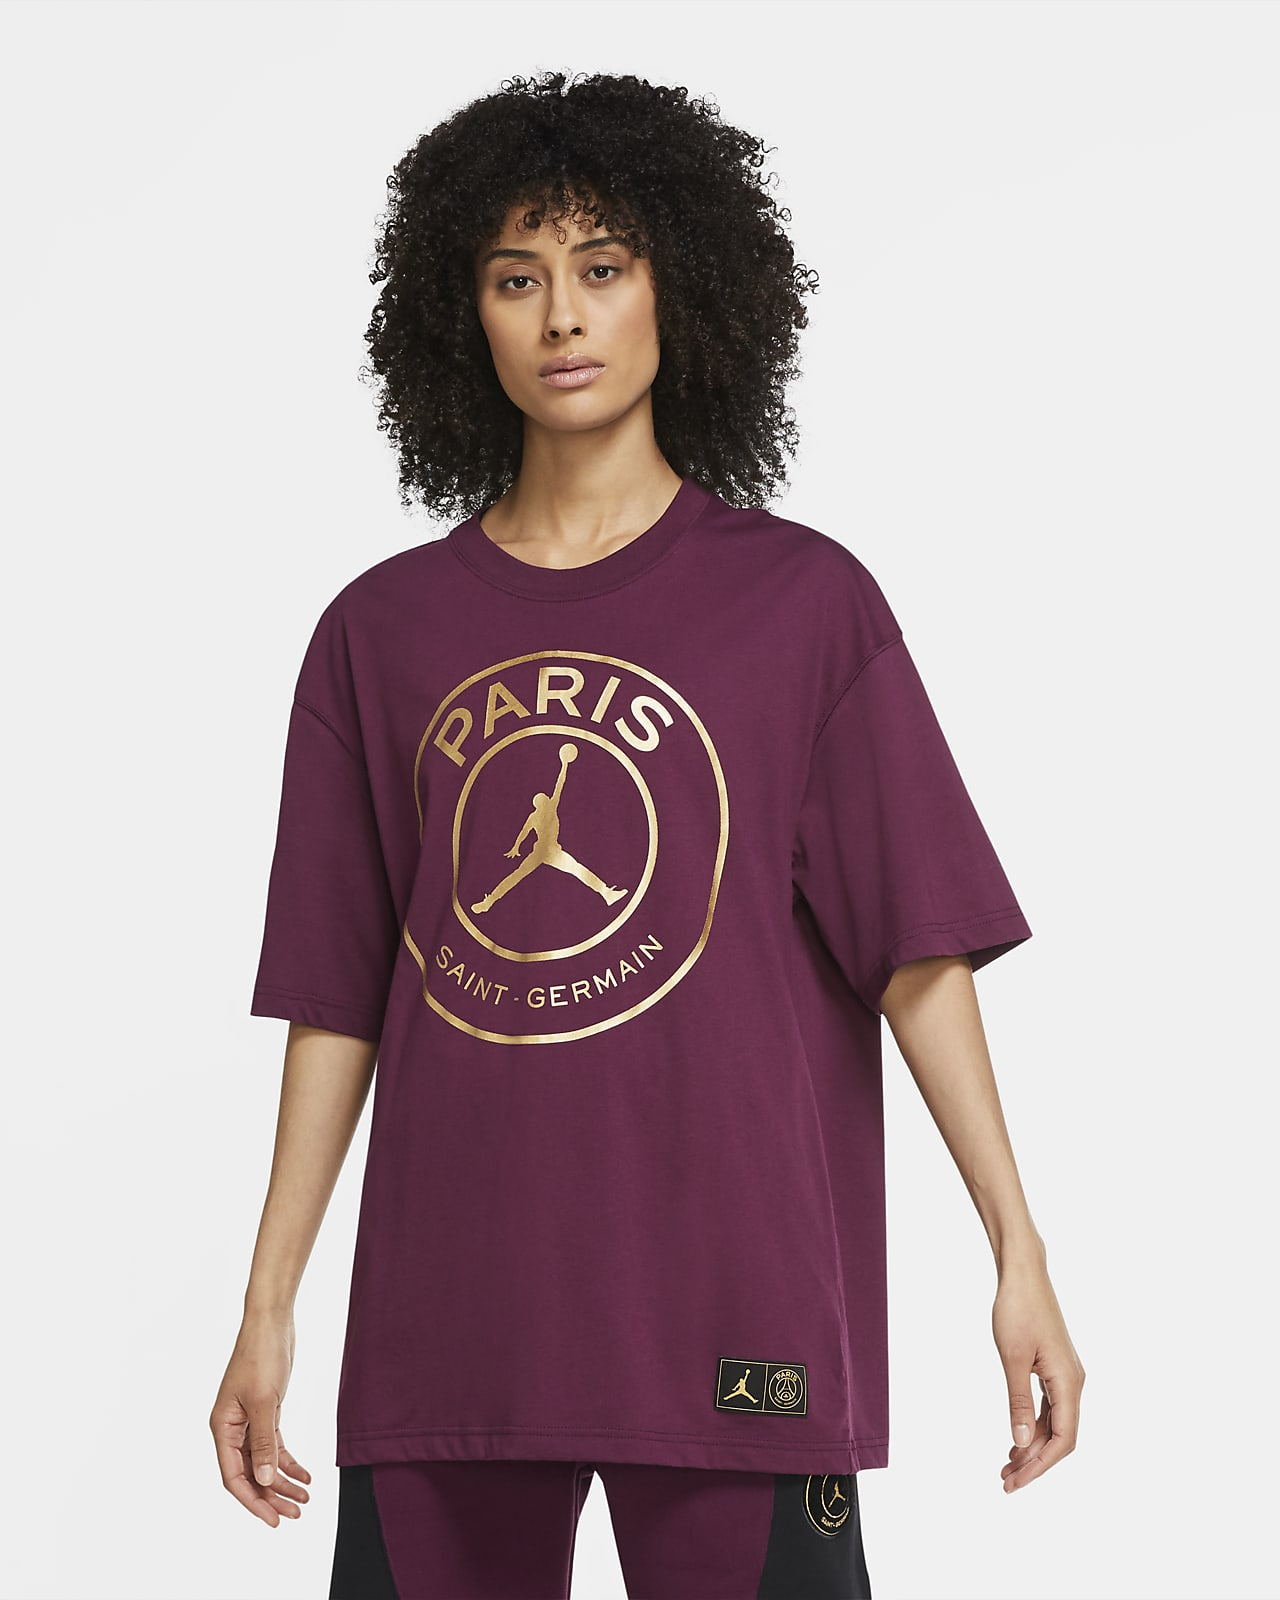 Paris Saint-Germain Bol Kadın Tişörtü